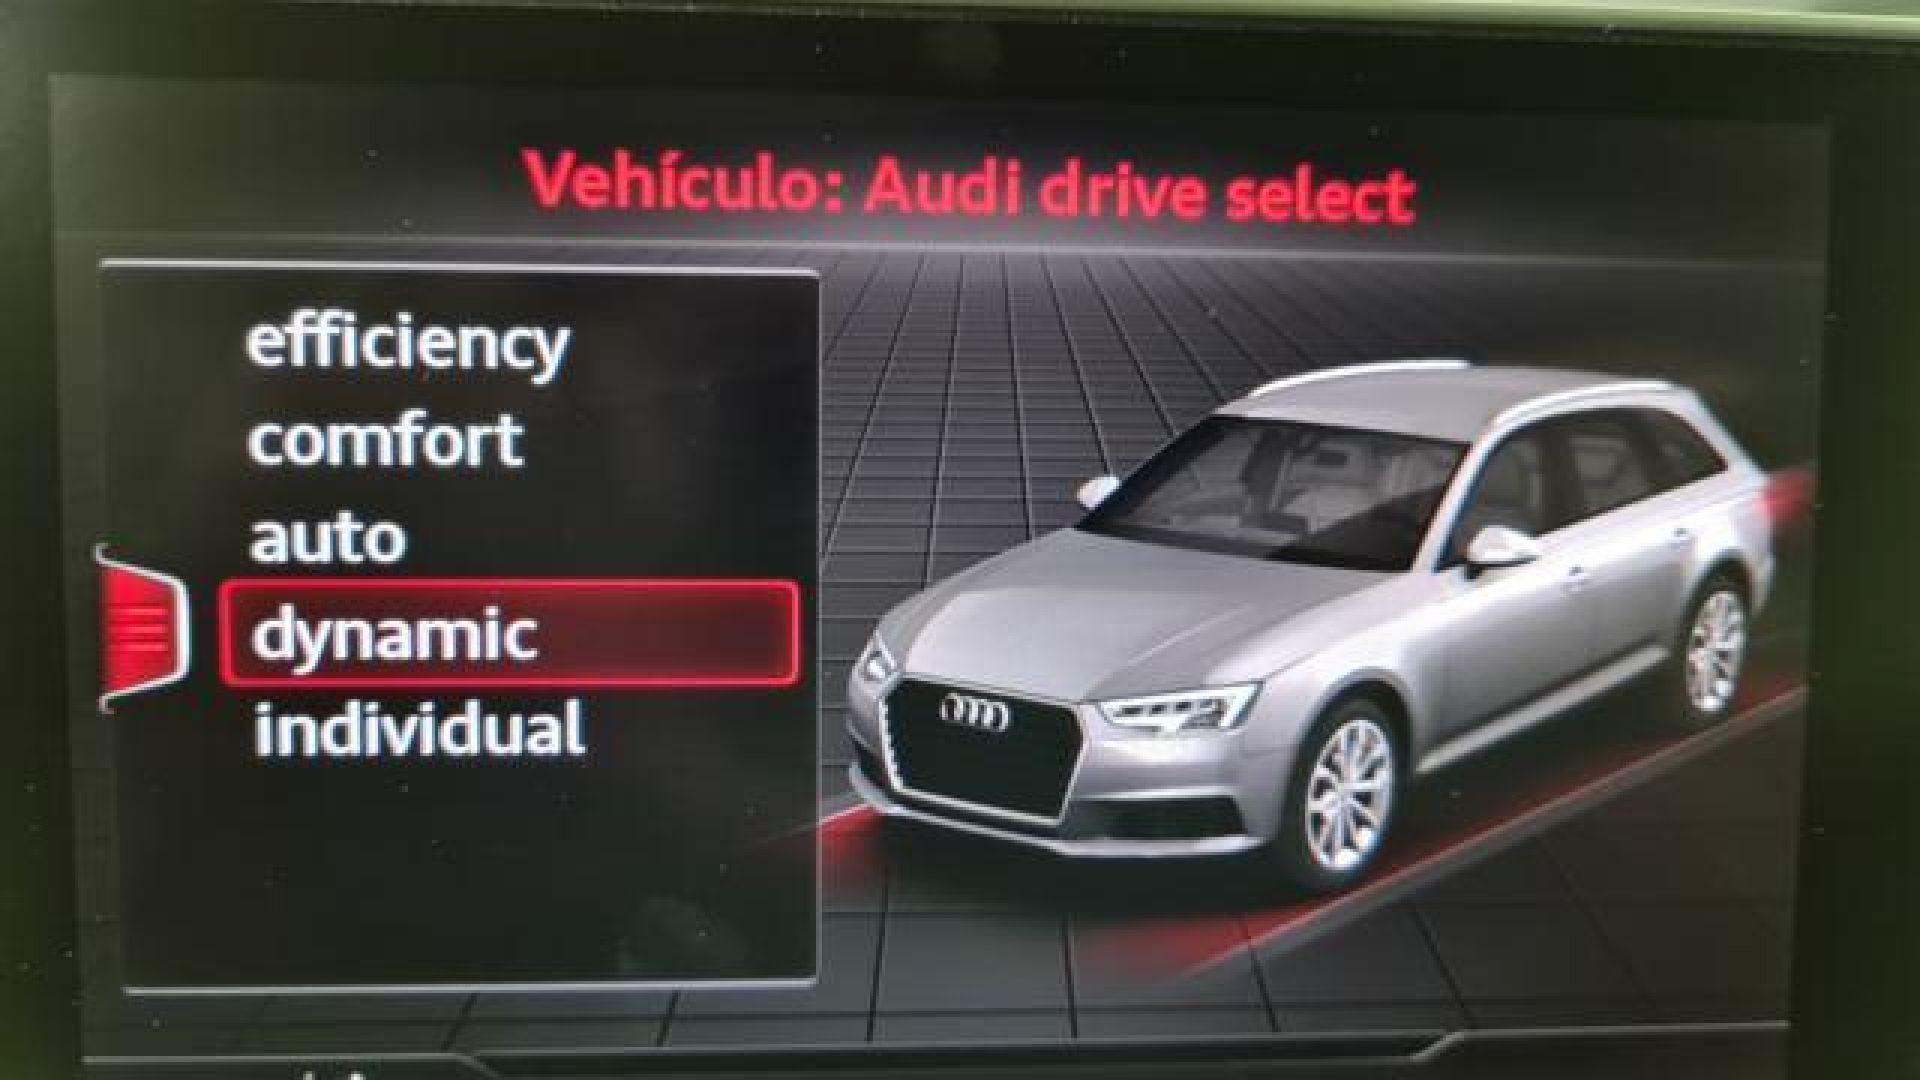 Audi A4 Avant 2.0 TDI quattro S tron Advanced ed